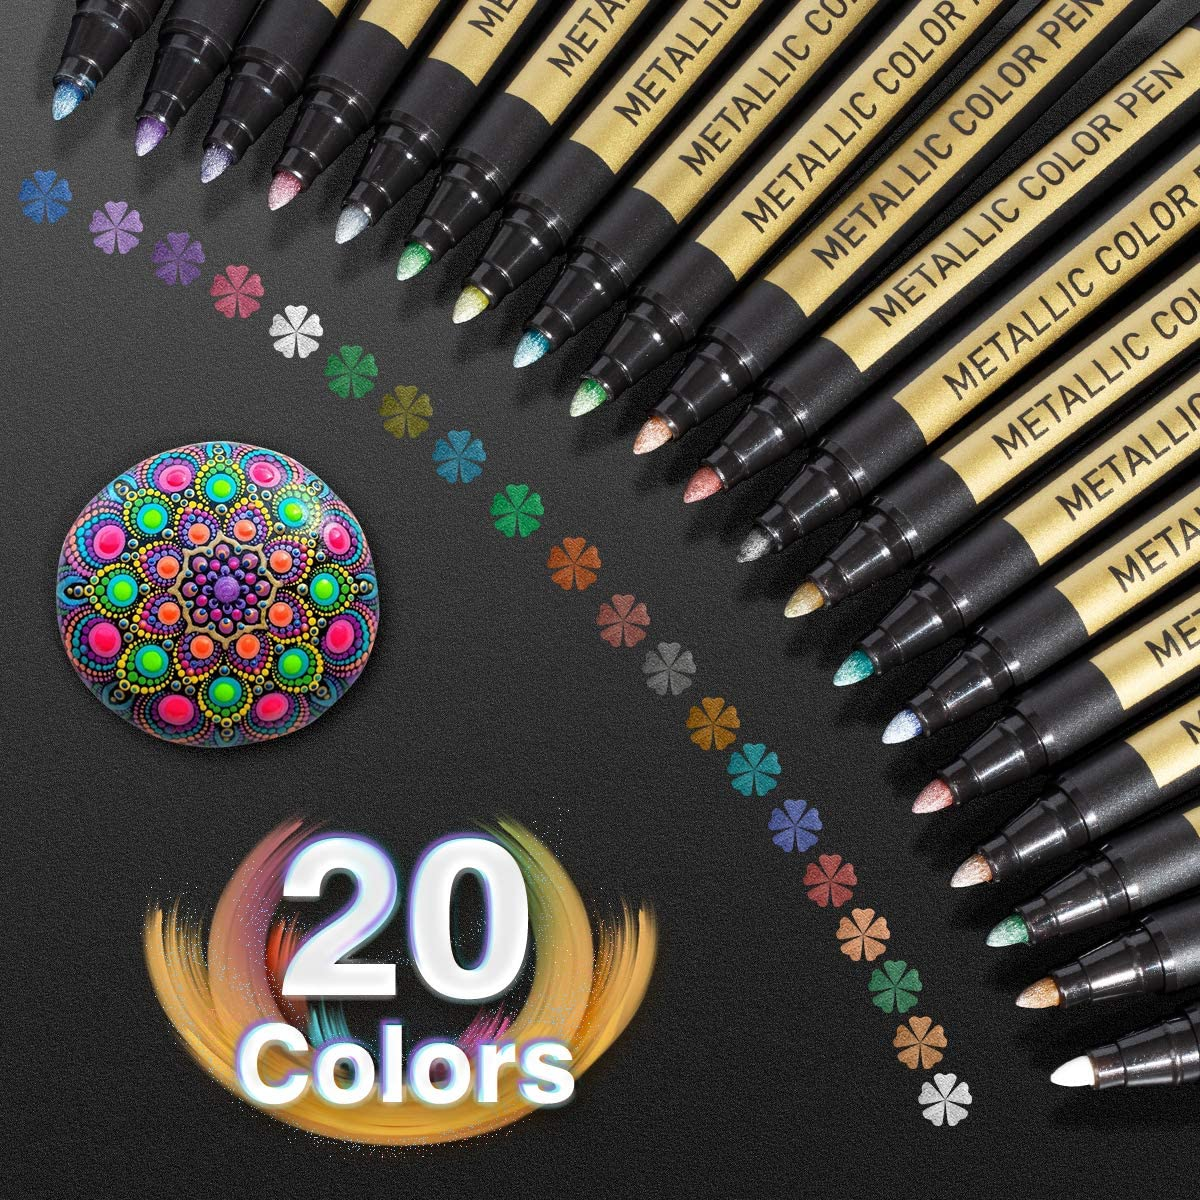 10/20 farbe Metallic Farbe Marker Pen Permanent Schreiben Rock Malerei Foto Album Sammelalbum Glas Holz Leinwand Karte Art marker